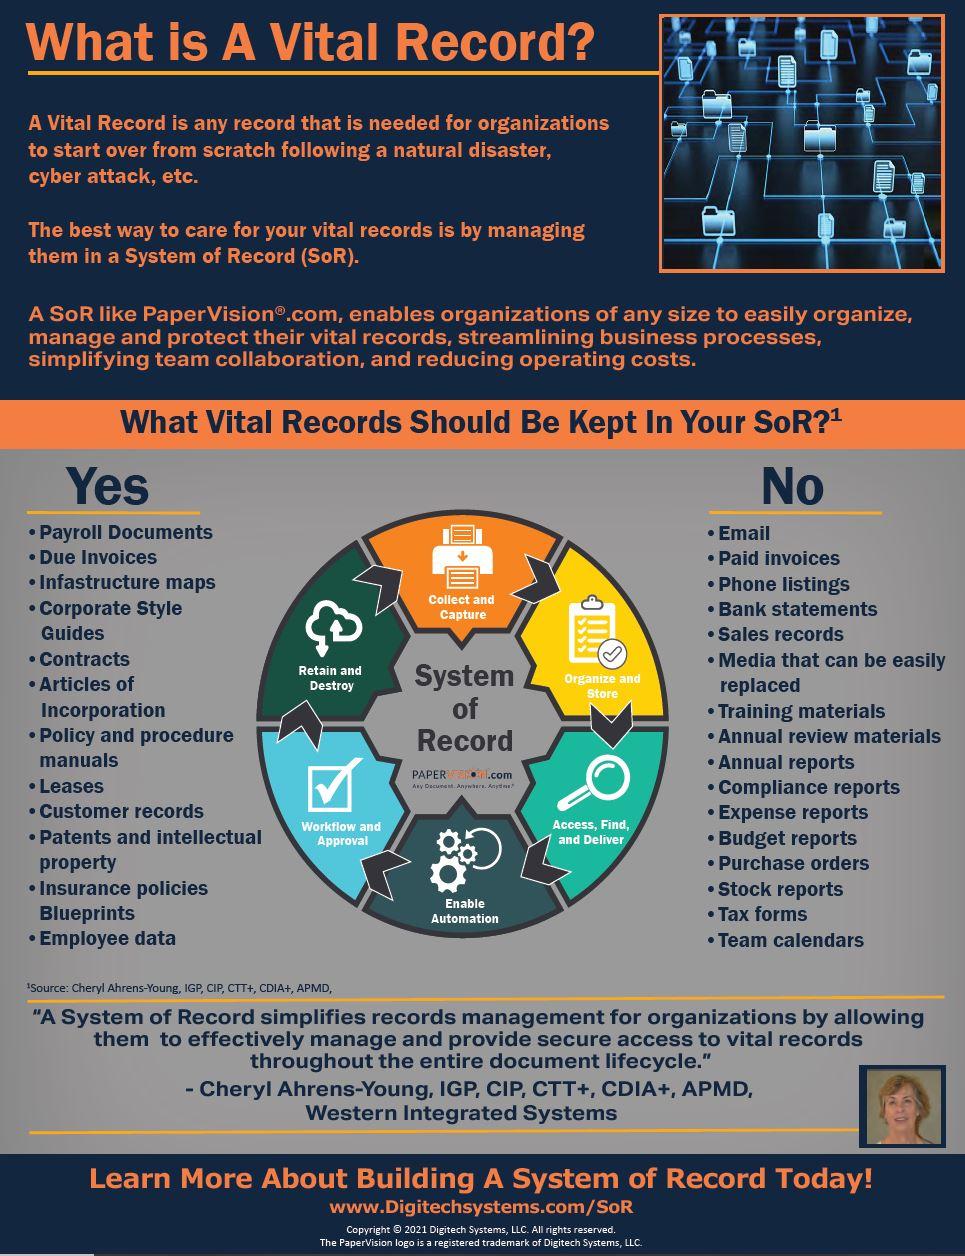 Record Retention Infographic Image